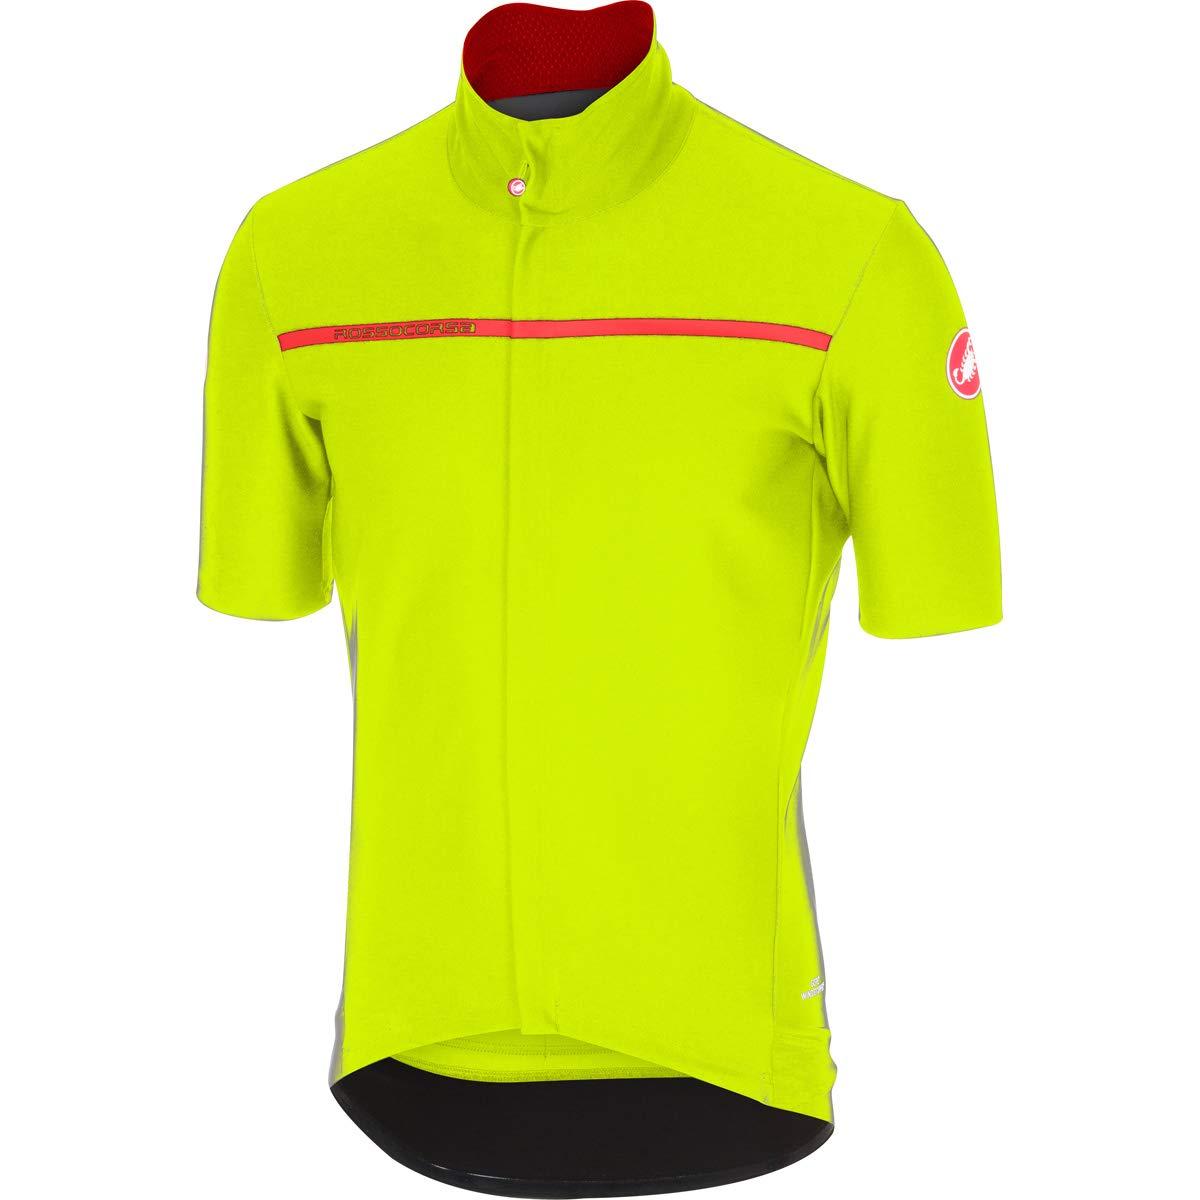 Castelli メンズ Gabba 3 半袖サイクリングジャケット - B17084 B01MSF31ZM Large|イエロー(Yellow Fluo) イエロー(Yellow Fluo) Large